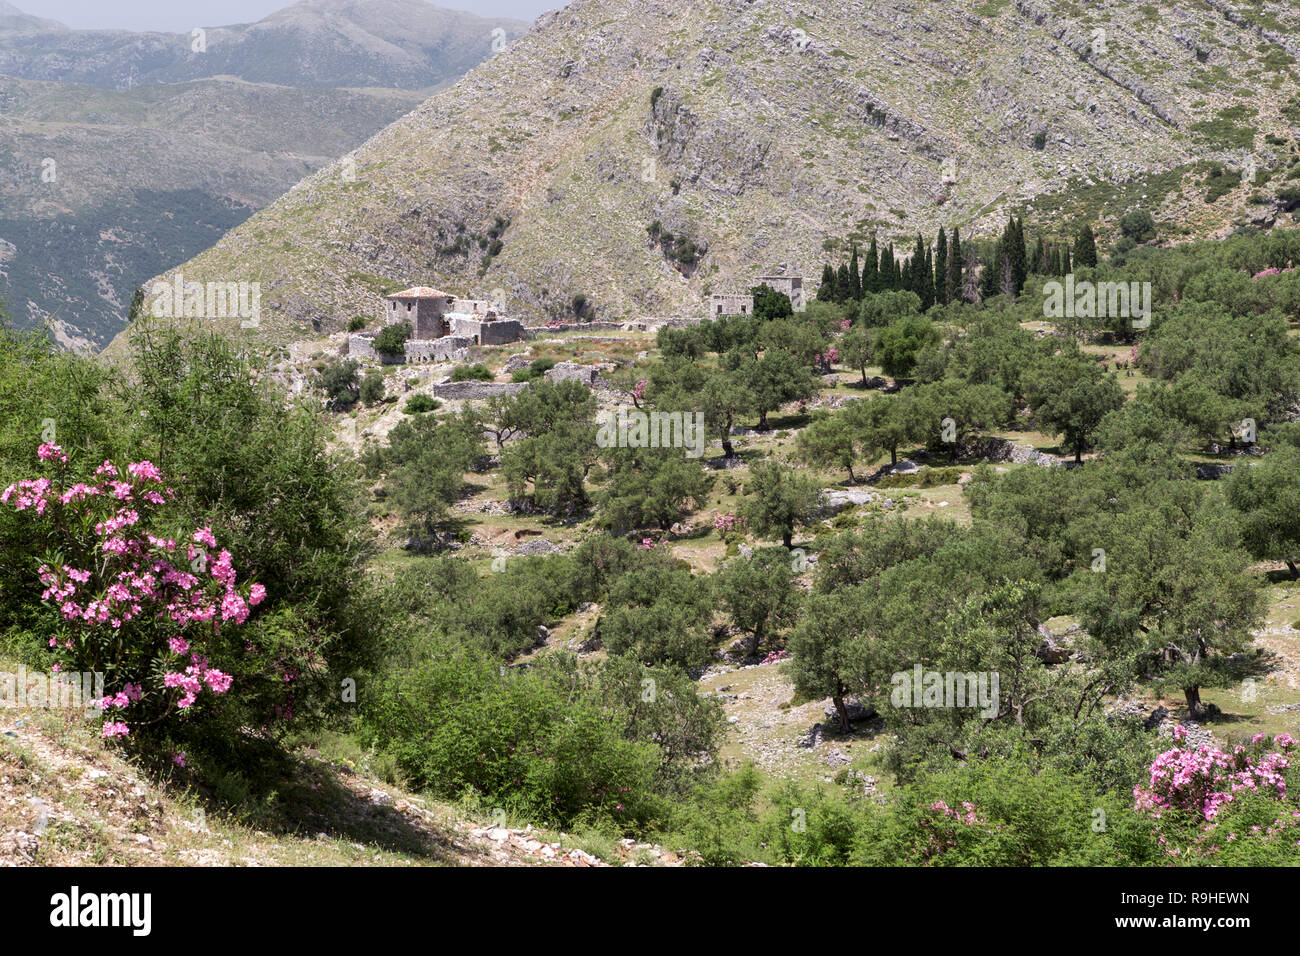 Qeparo Fshat village Albania - Stock Image